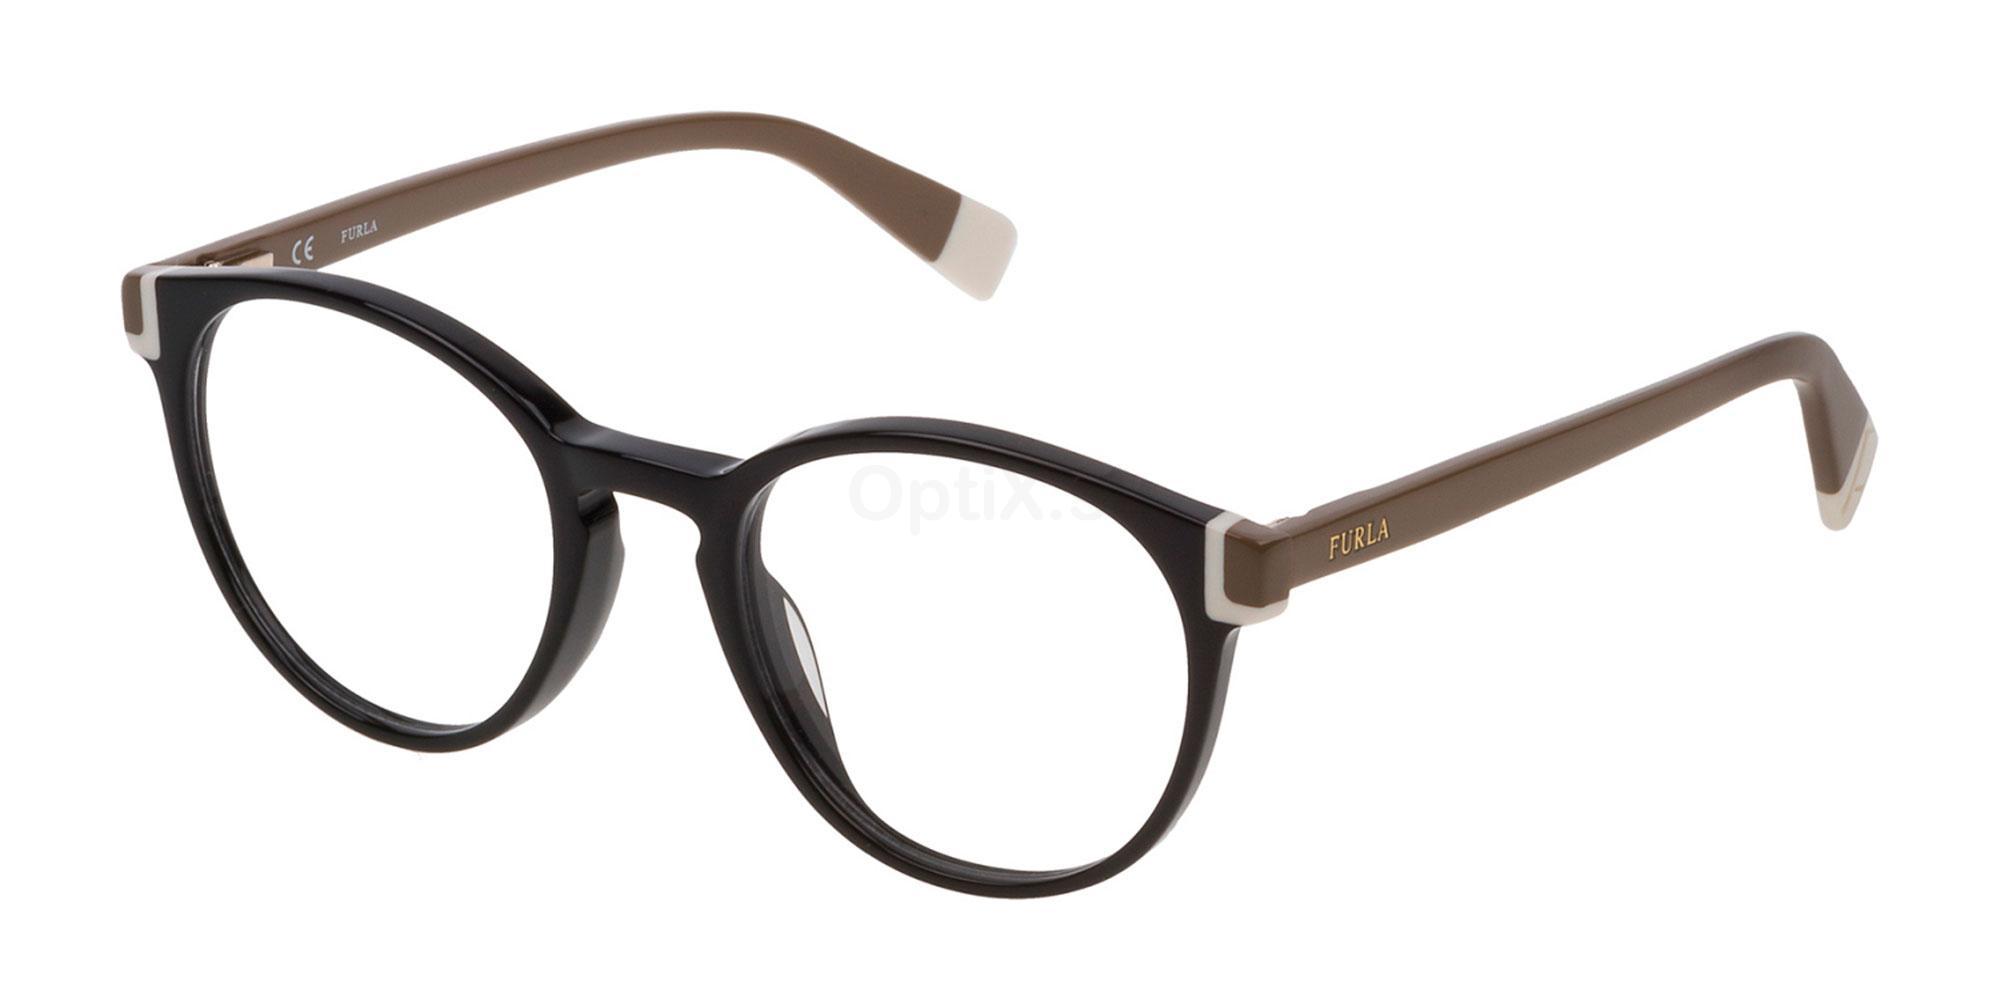 0700 VFU194 Glasses, Furla